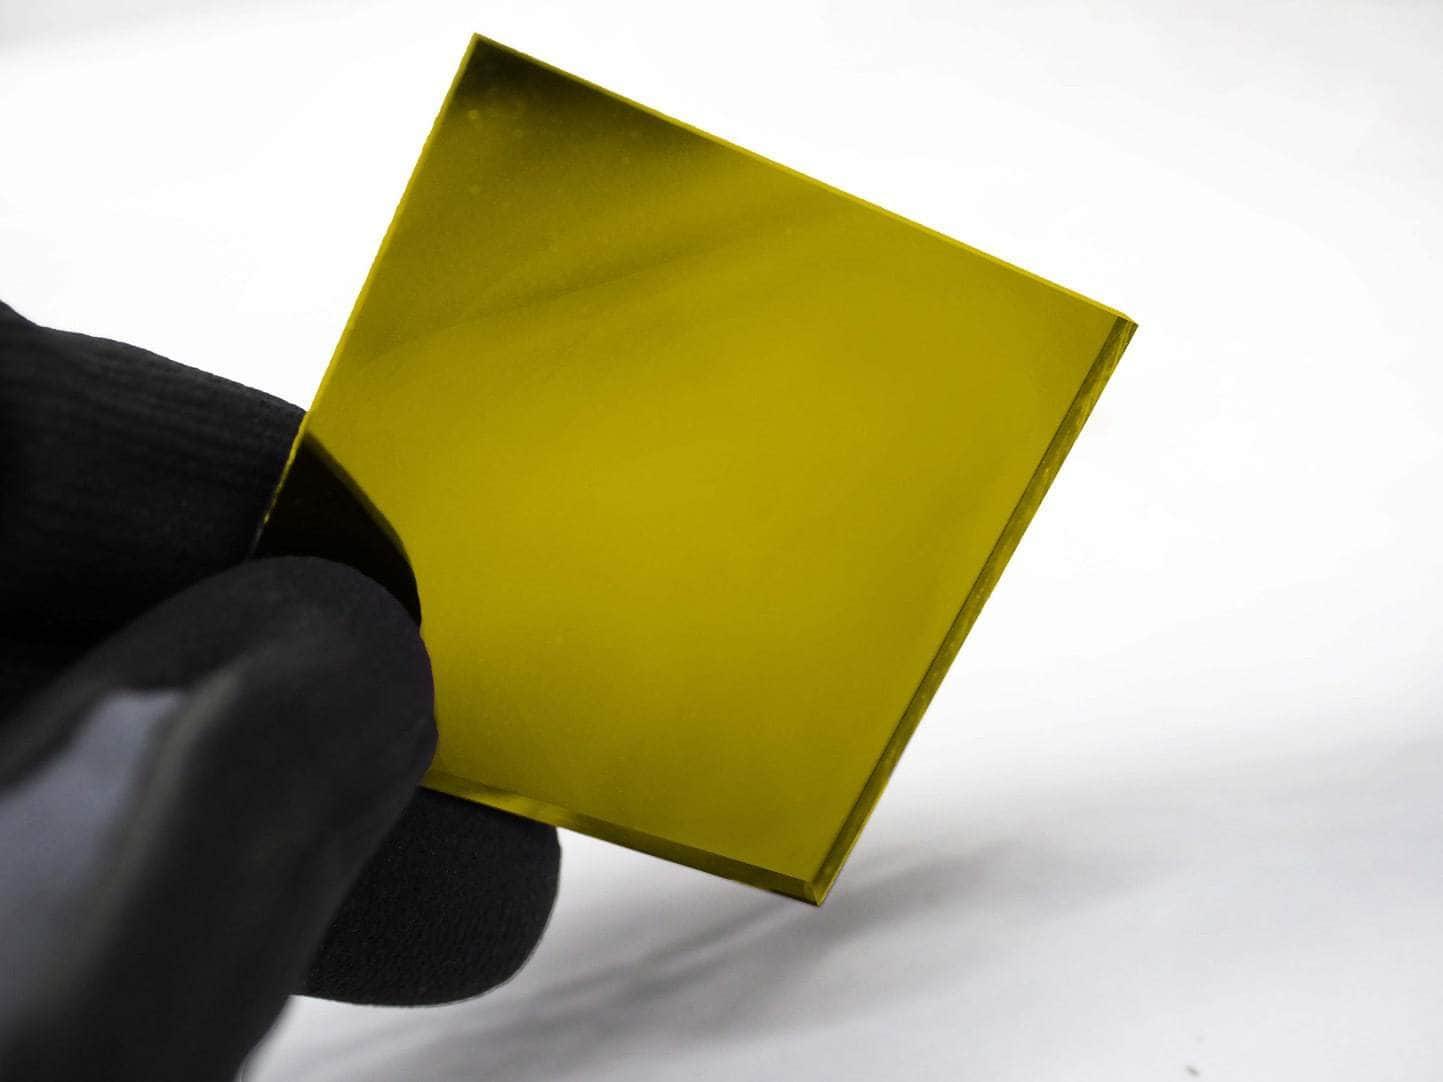 Acrylic two way mirror color sample 2208 Yellow